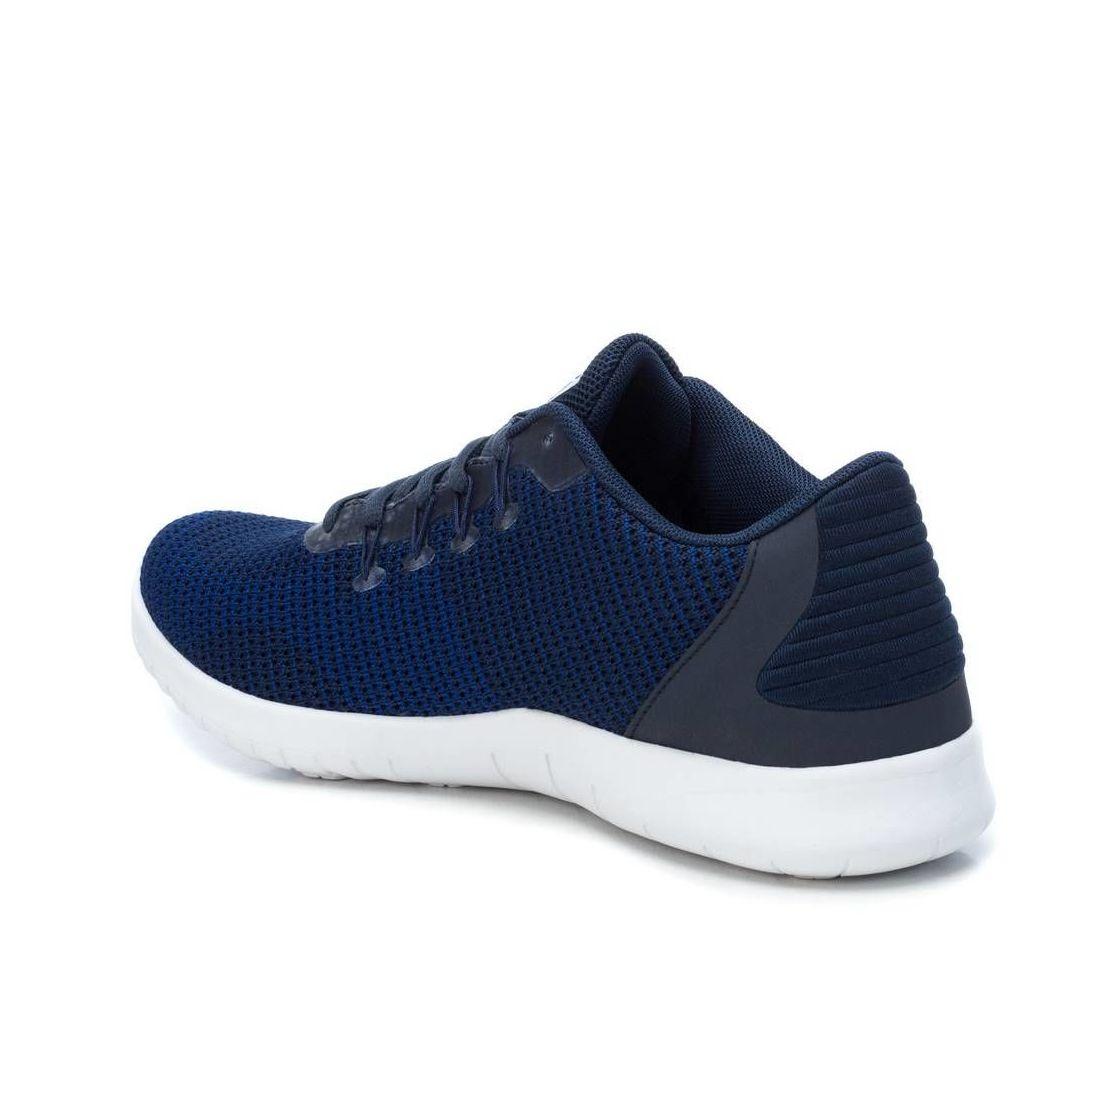 sneakers uomo xti 04338302 7223